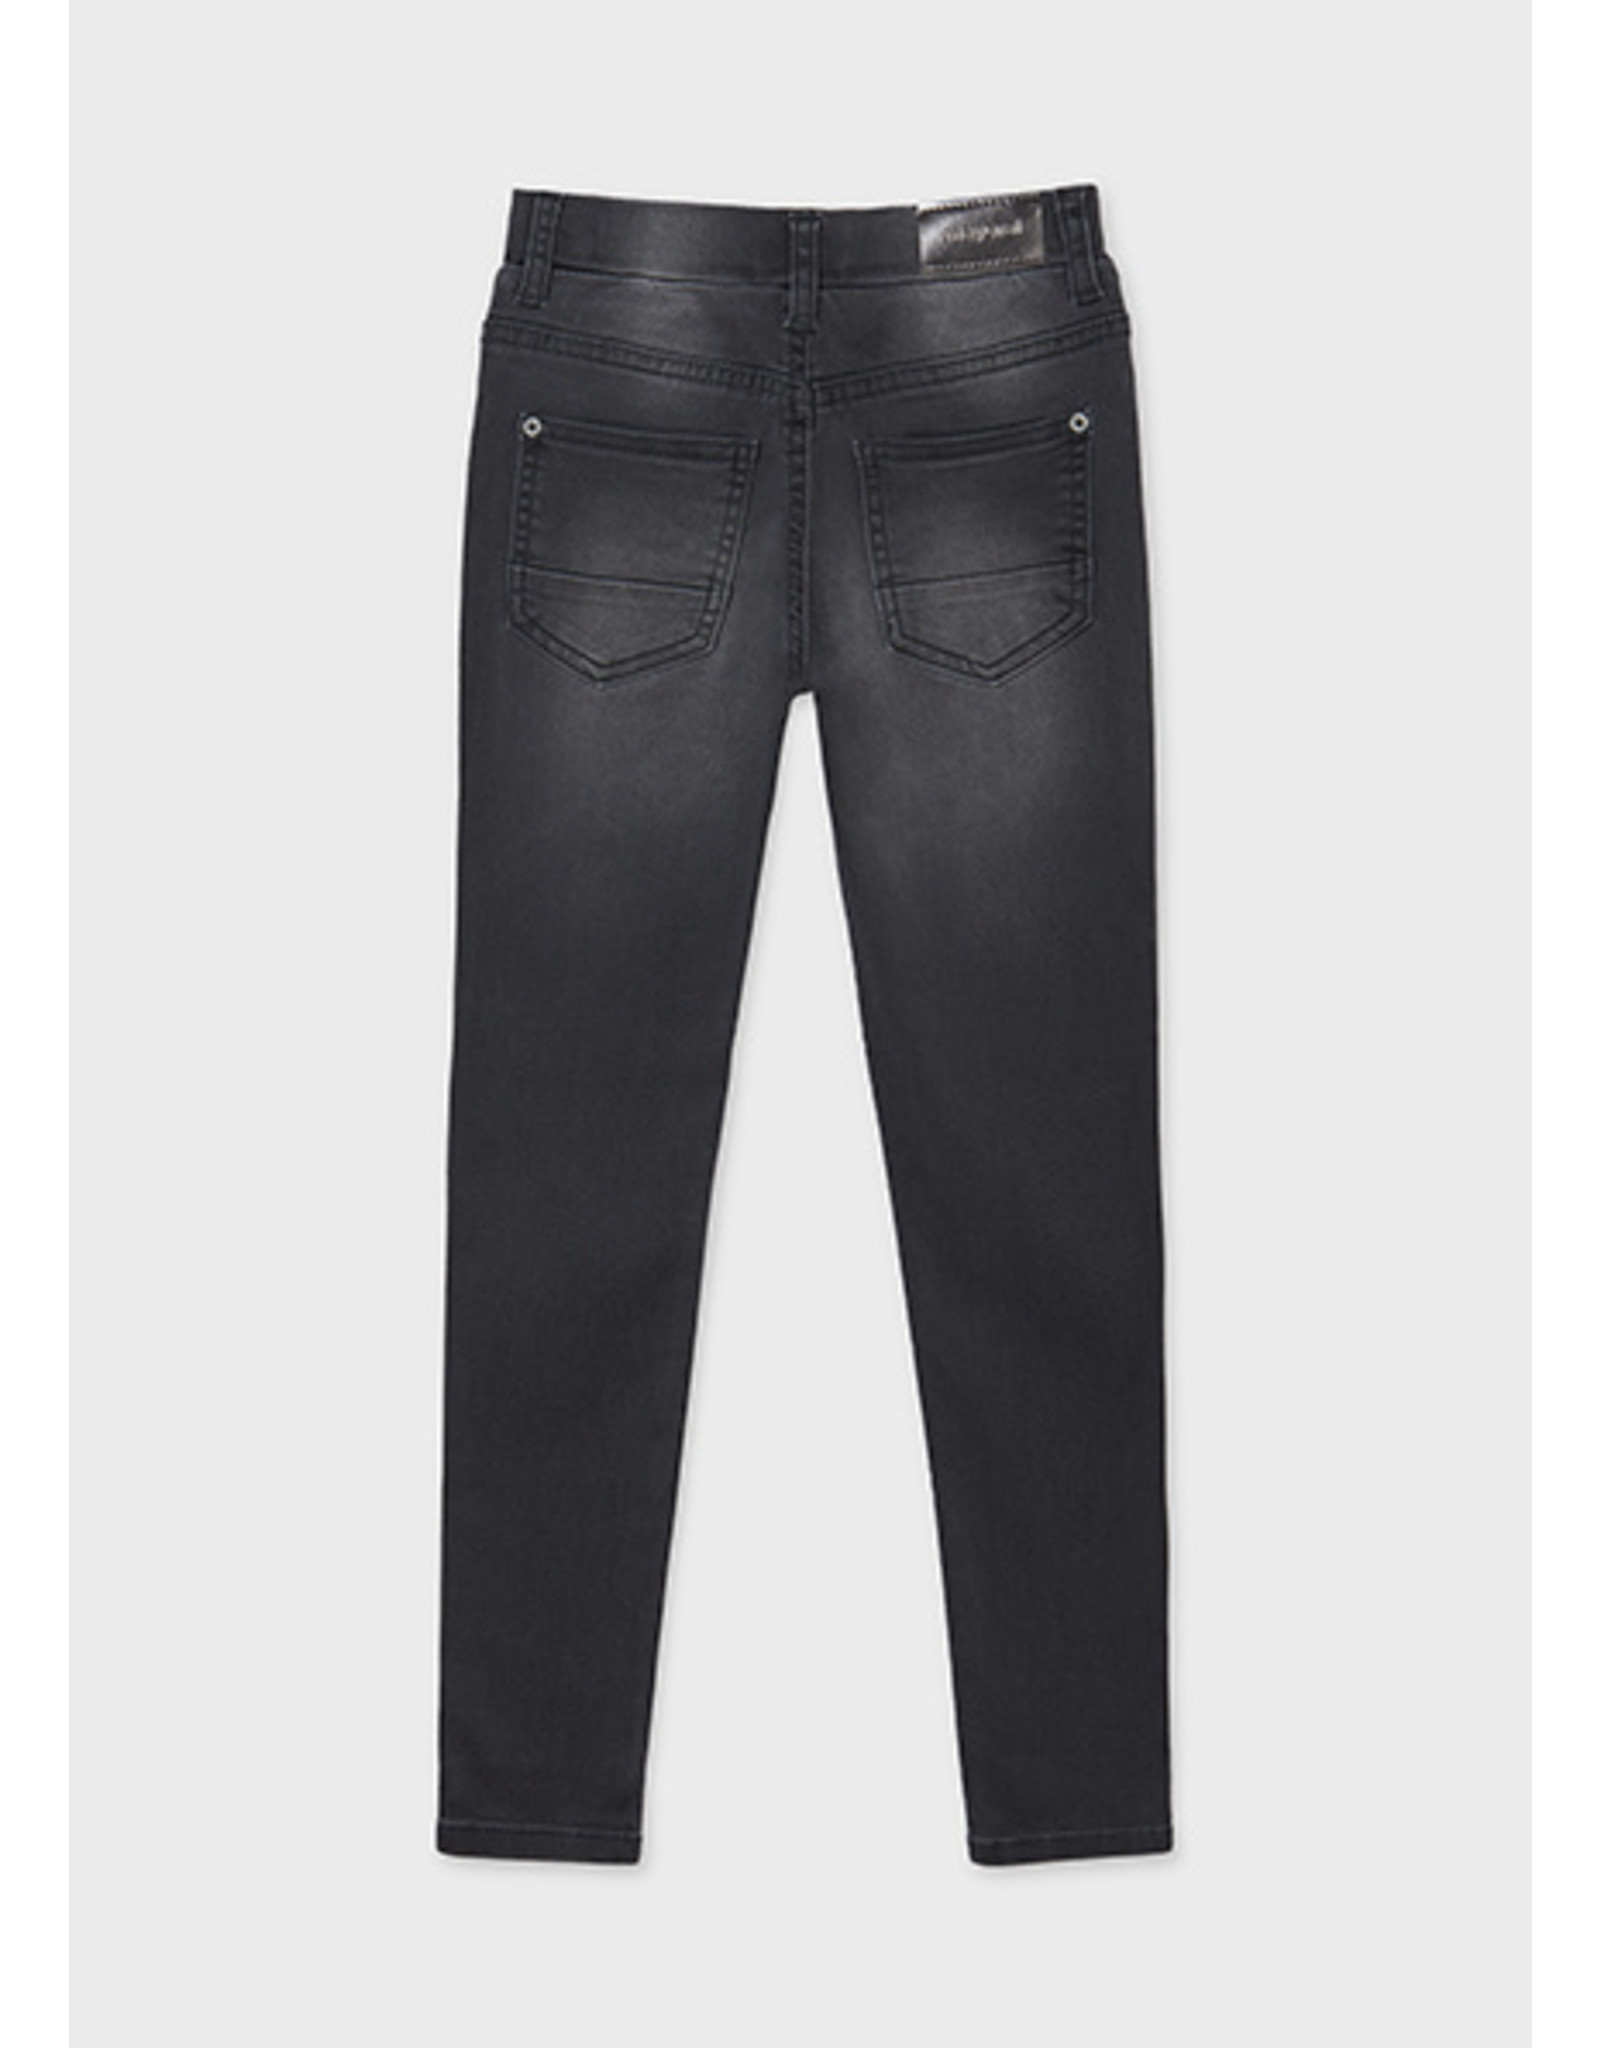 Mayoral skinny jeans grijs